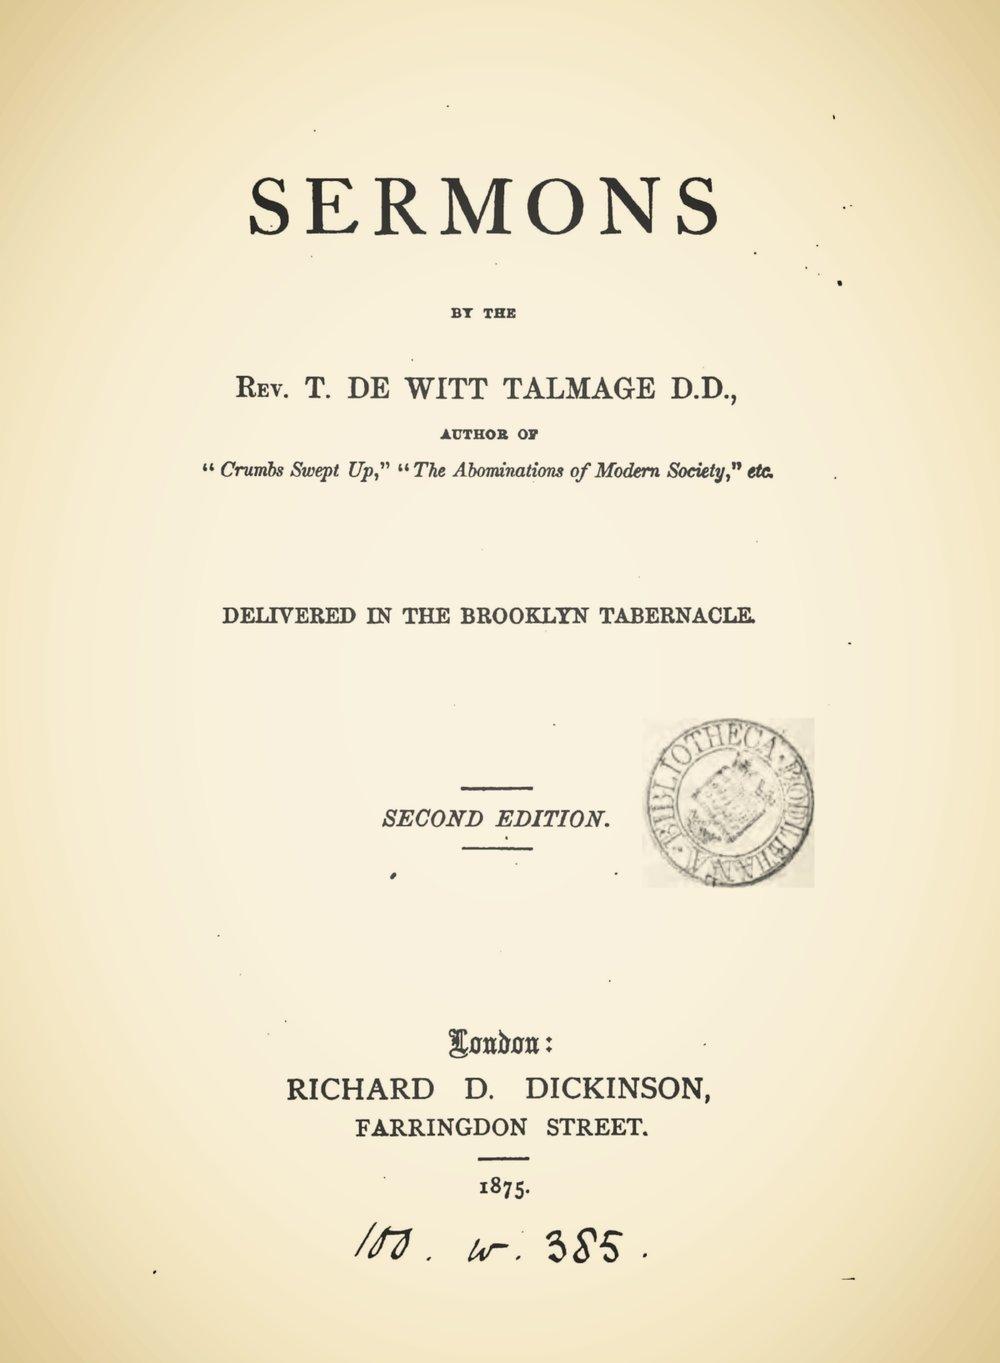 Talmage, Thomas De Witt, Sermons Title Page.jpg